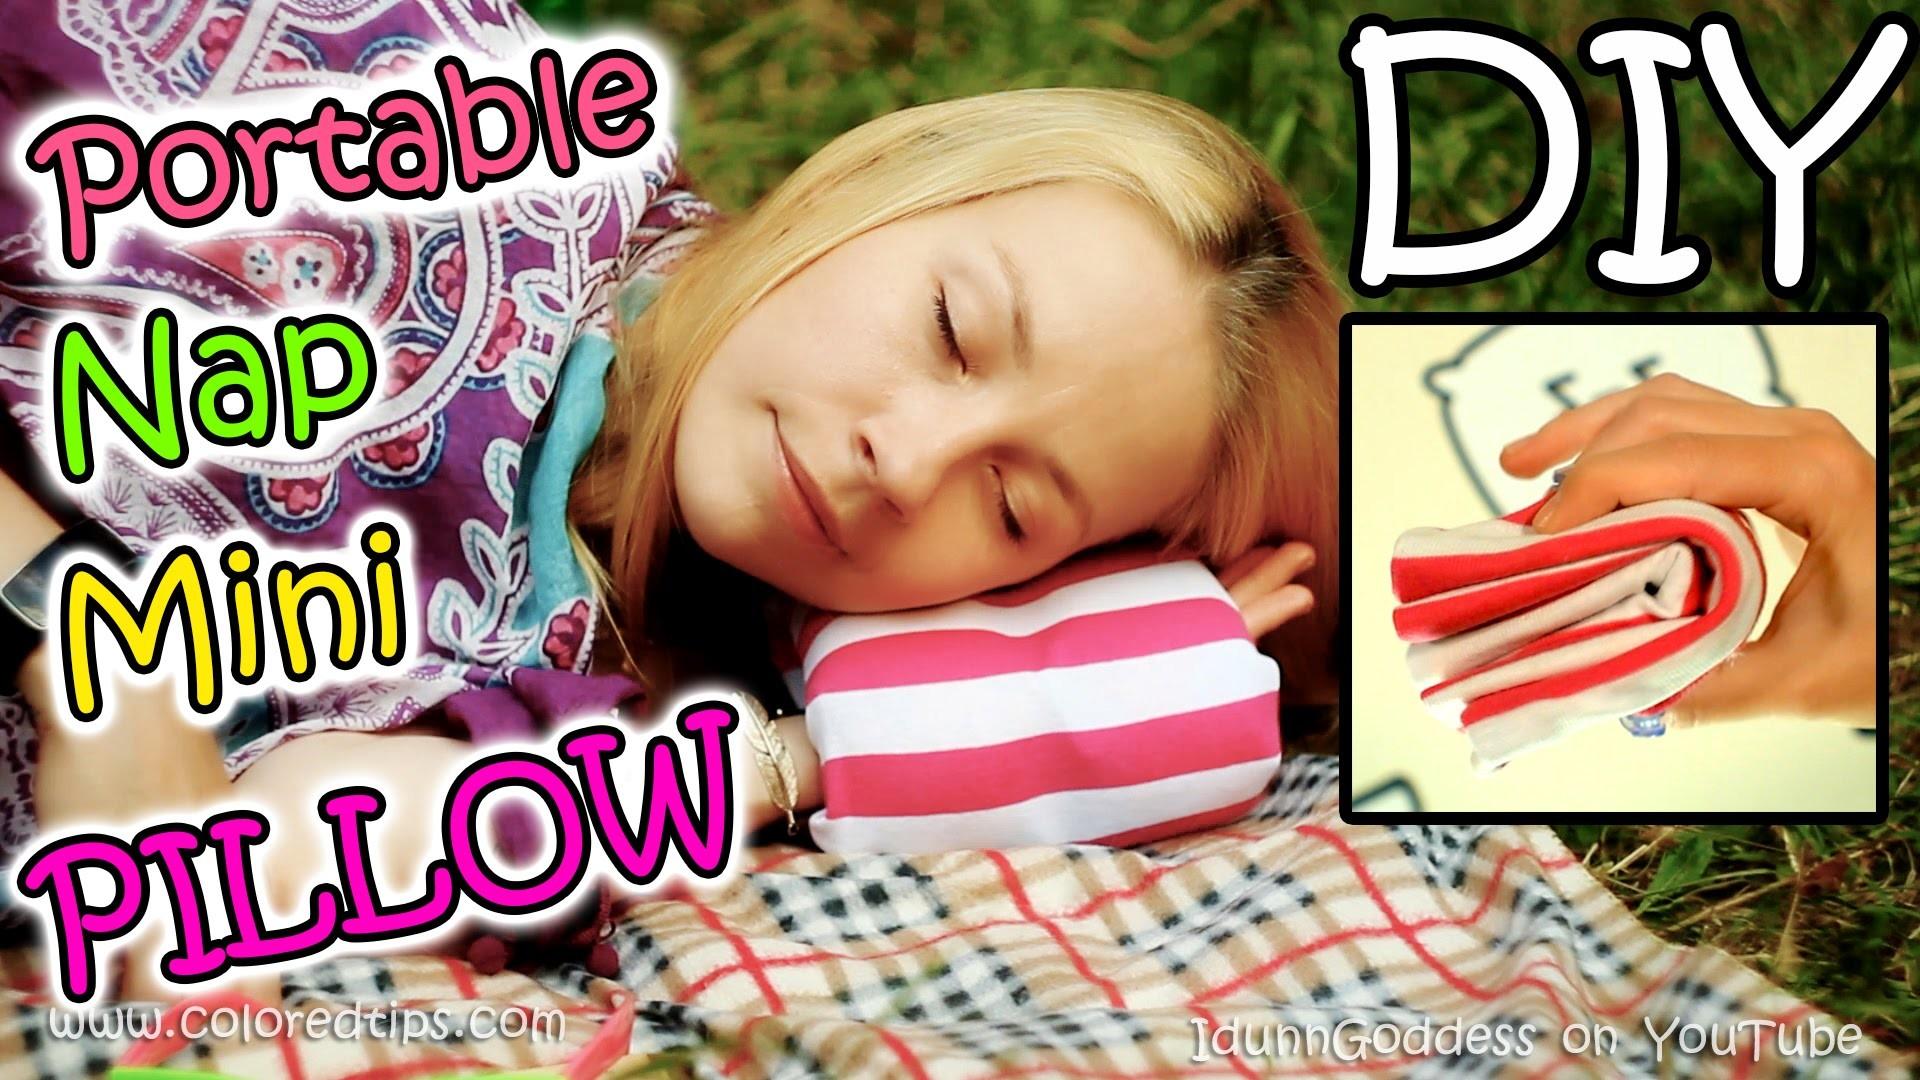 How To Make Portable Nap Mini Pillow - DIY Compact Travel Napping Pillow